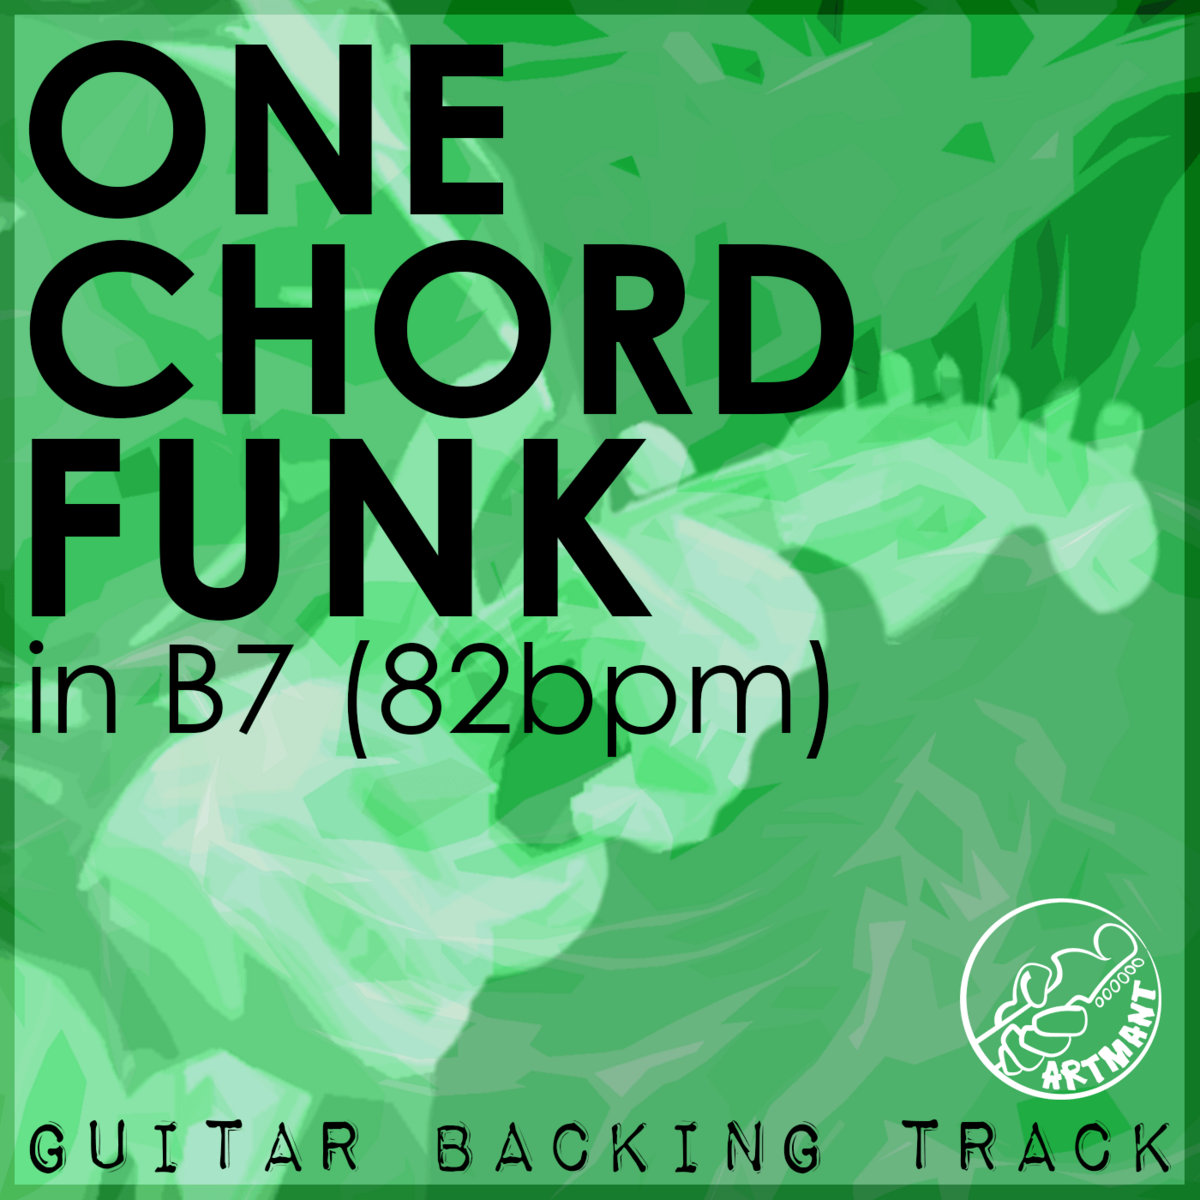 One Chord Funk Backing Track B7 82bpm Artmant Studios